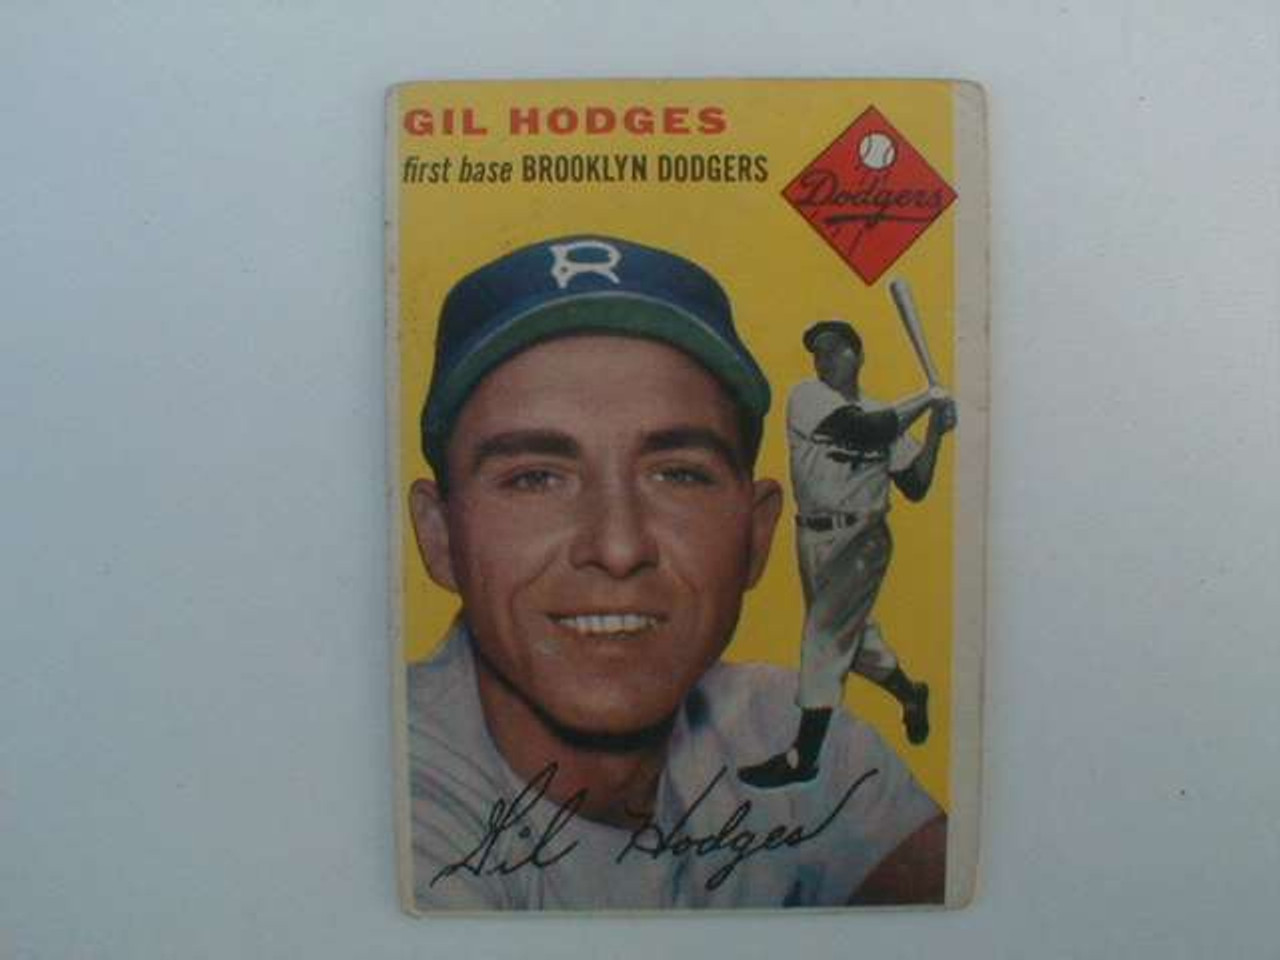 Vintage 1954 Topps Gil Hodges Baseball Card